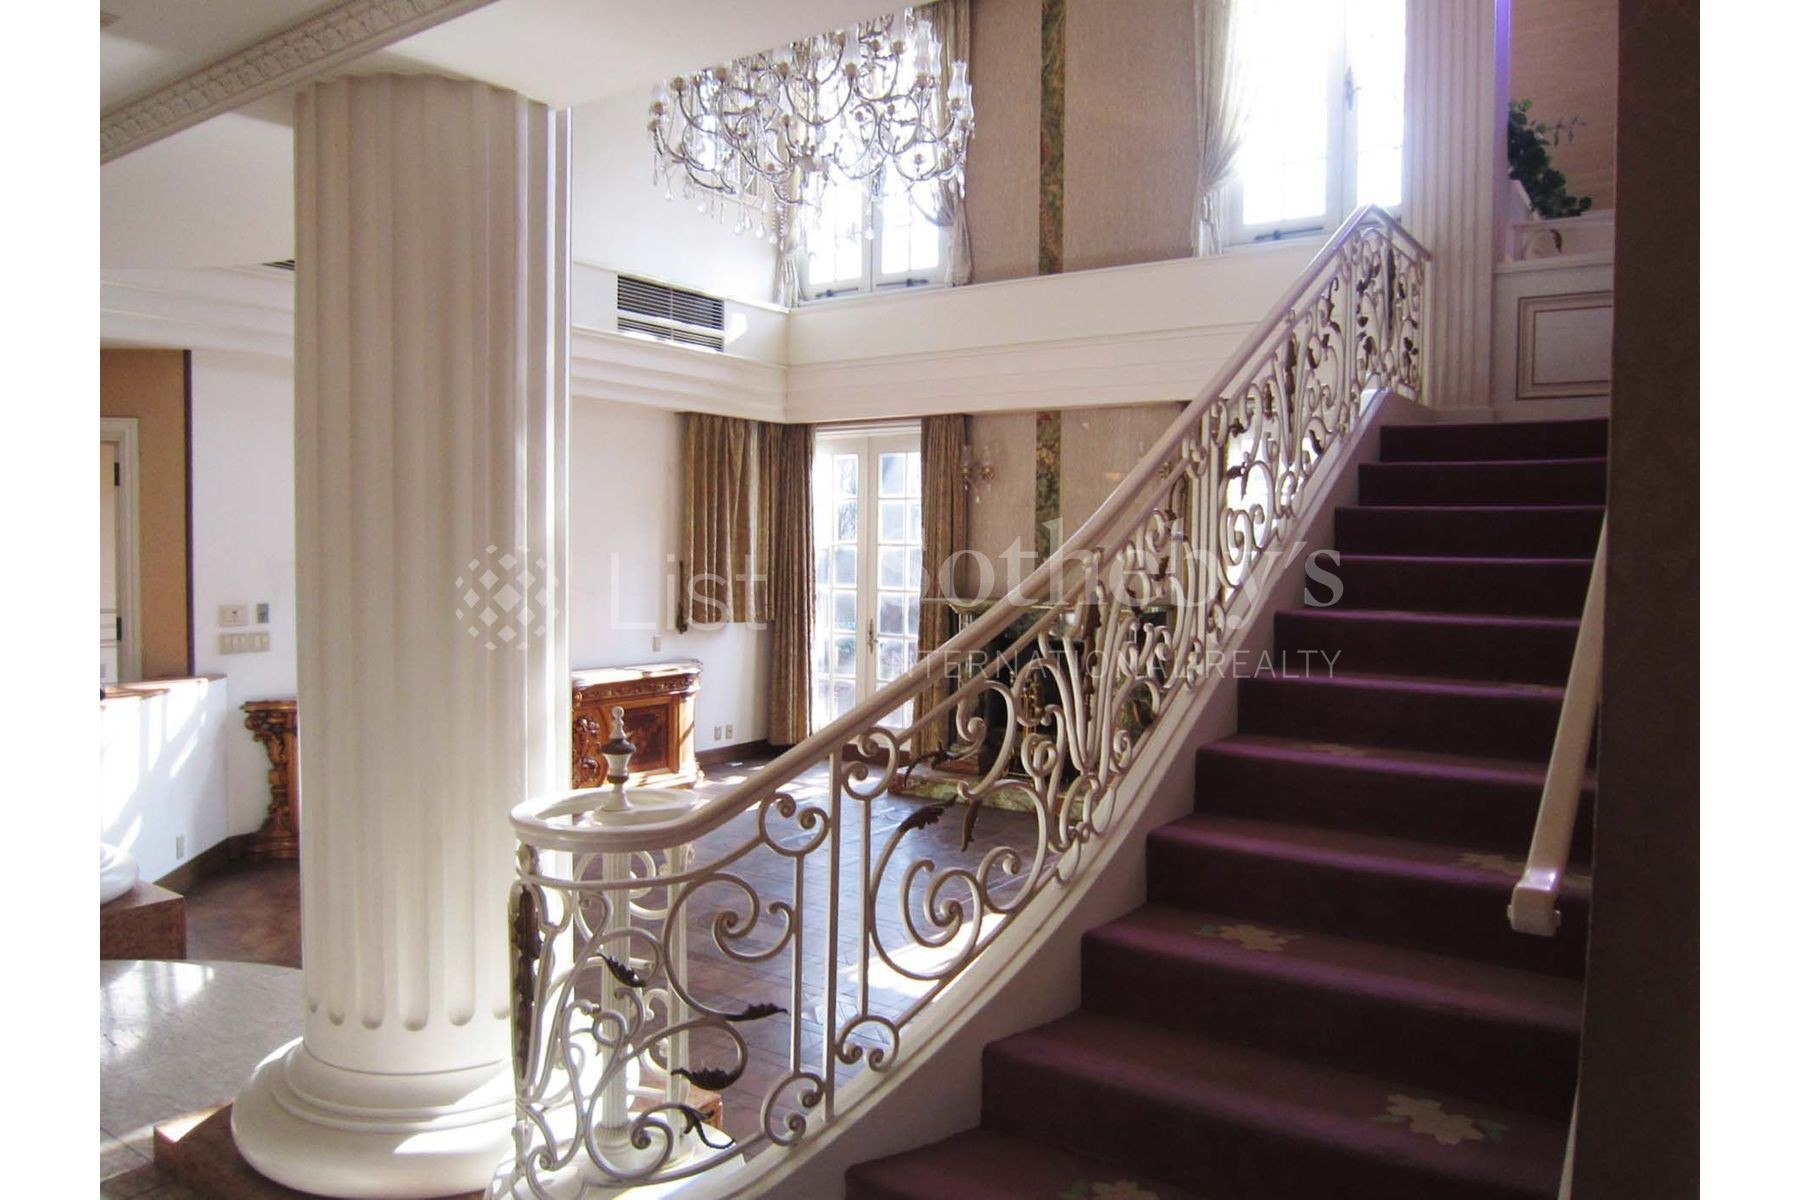 Kugahara House, luxury home in Ota-Ku, Tokyo, Japan | Stairs | Sotheby's International Realty | Finest Residences